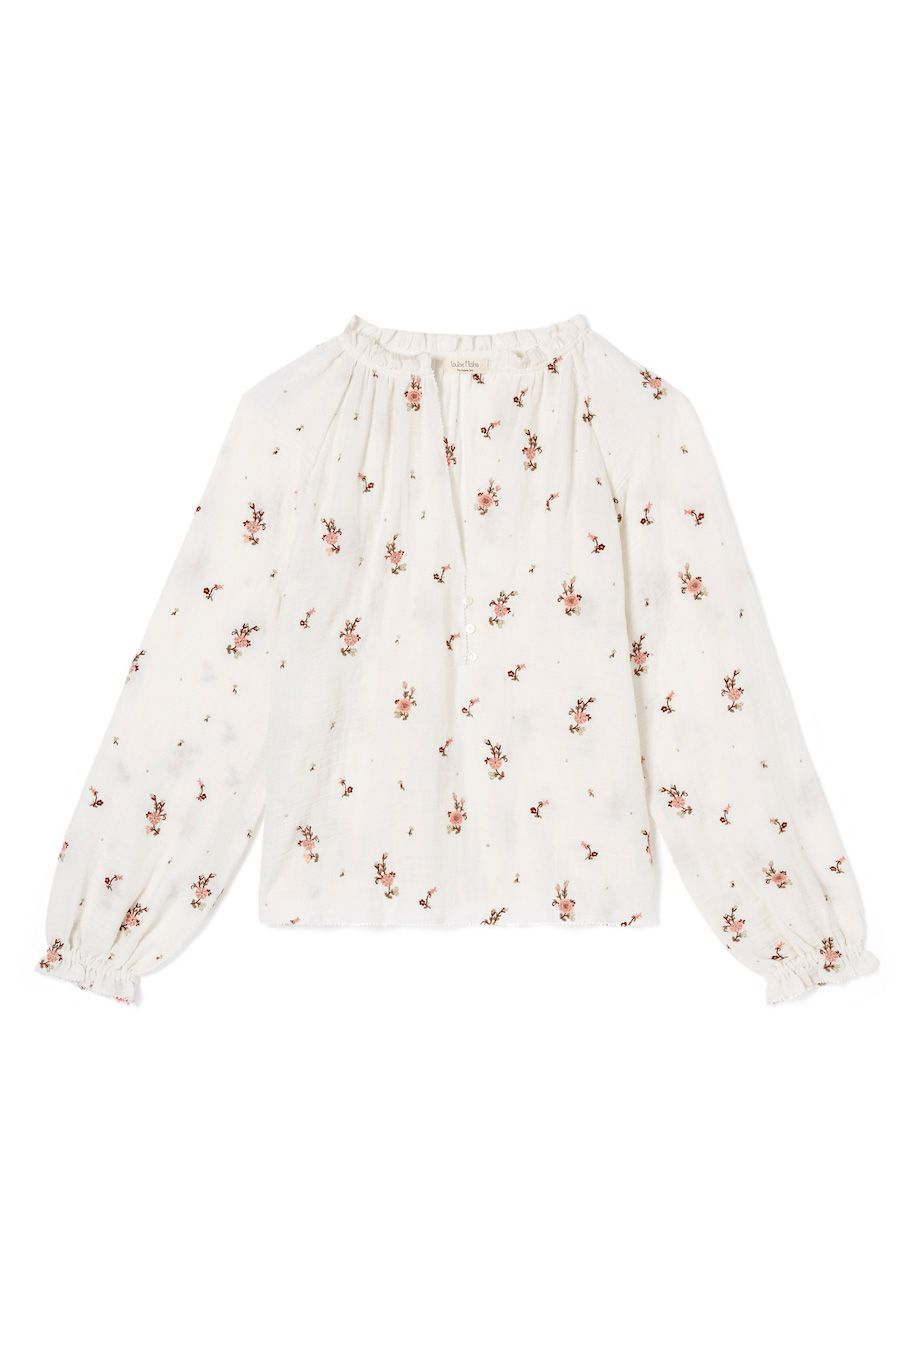 boheme chic vintage blouse femme leonora off-white flowers